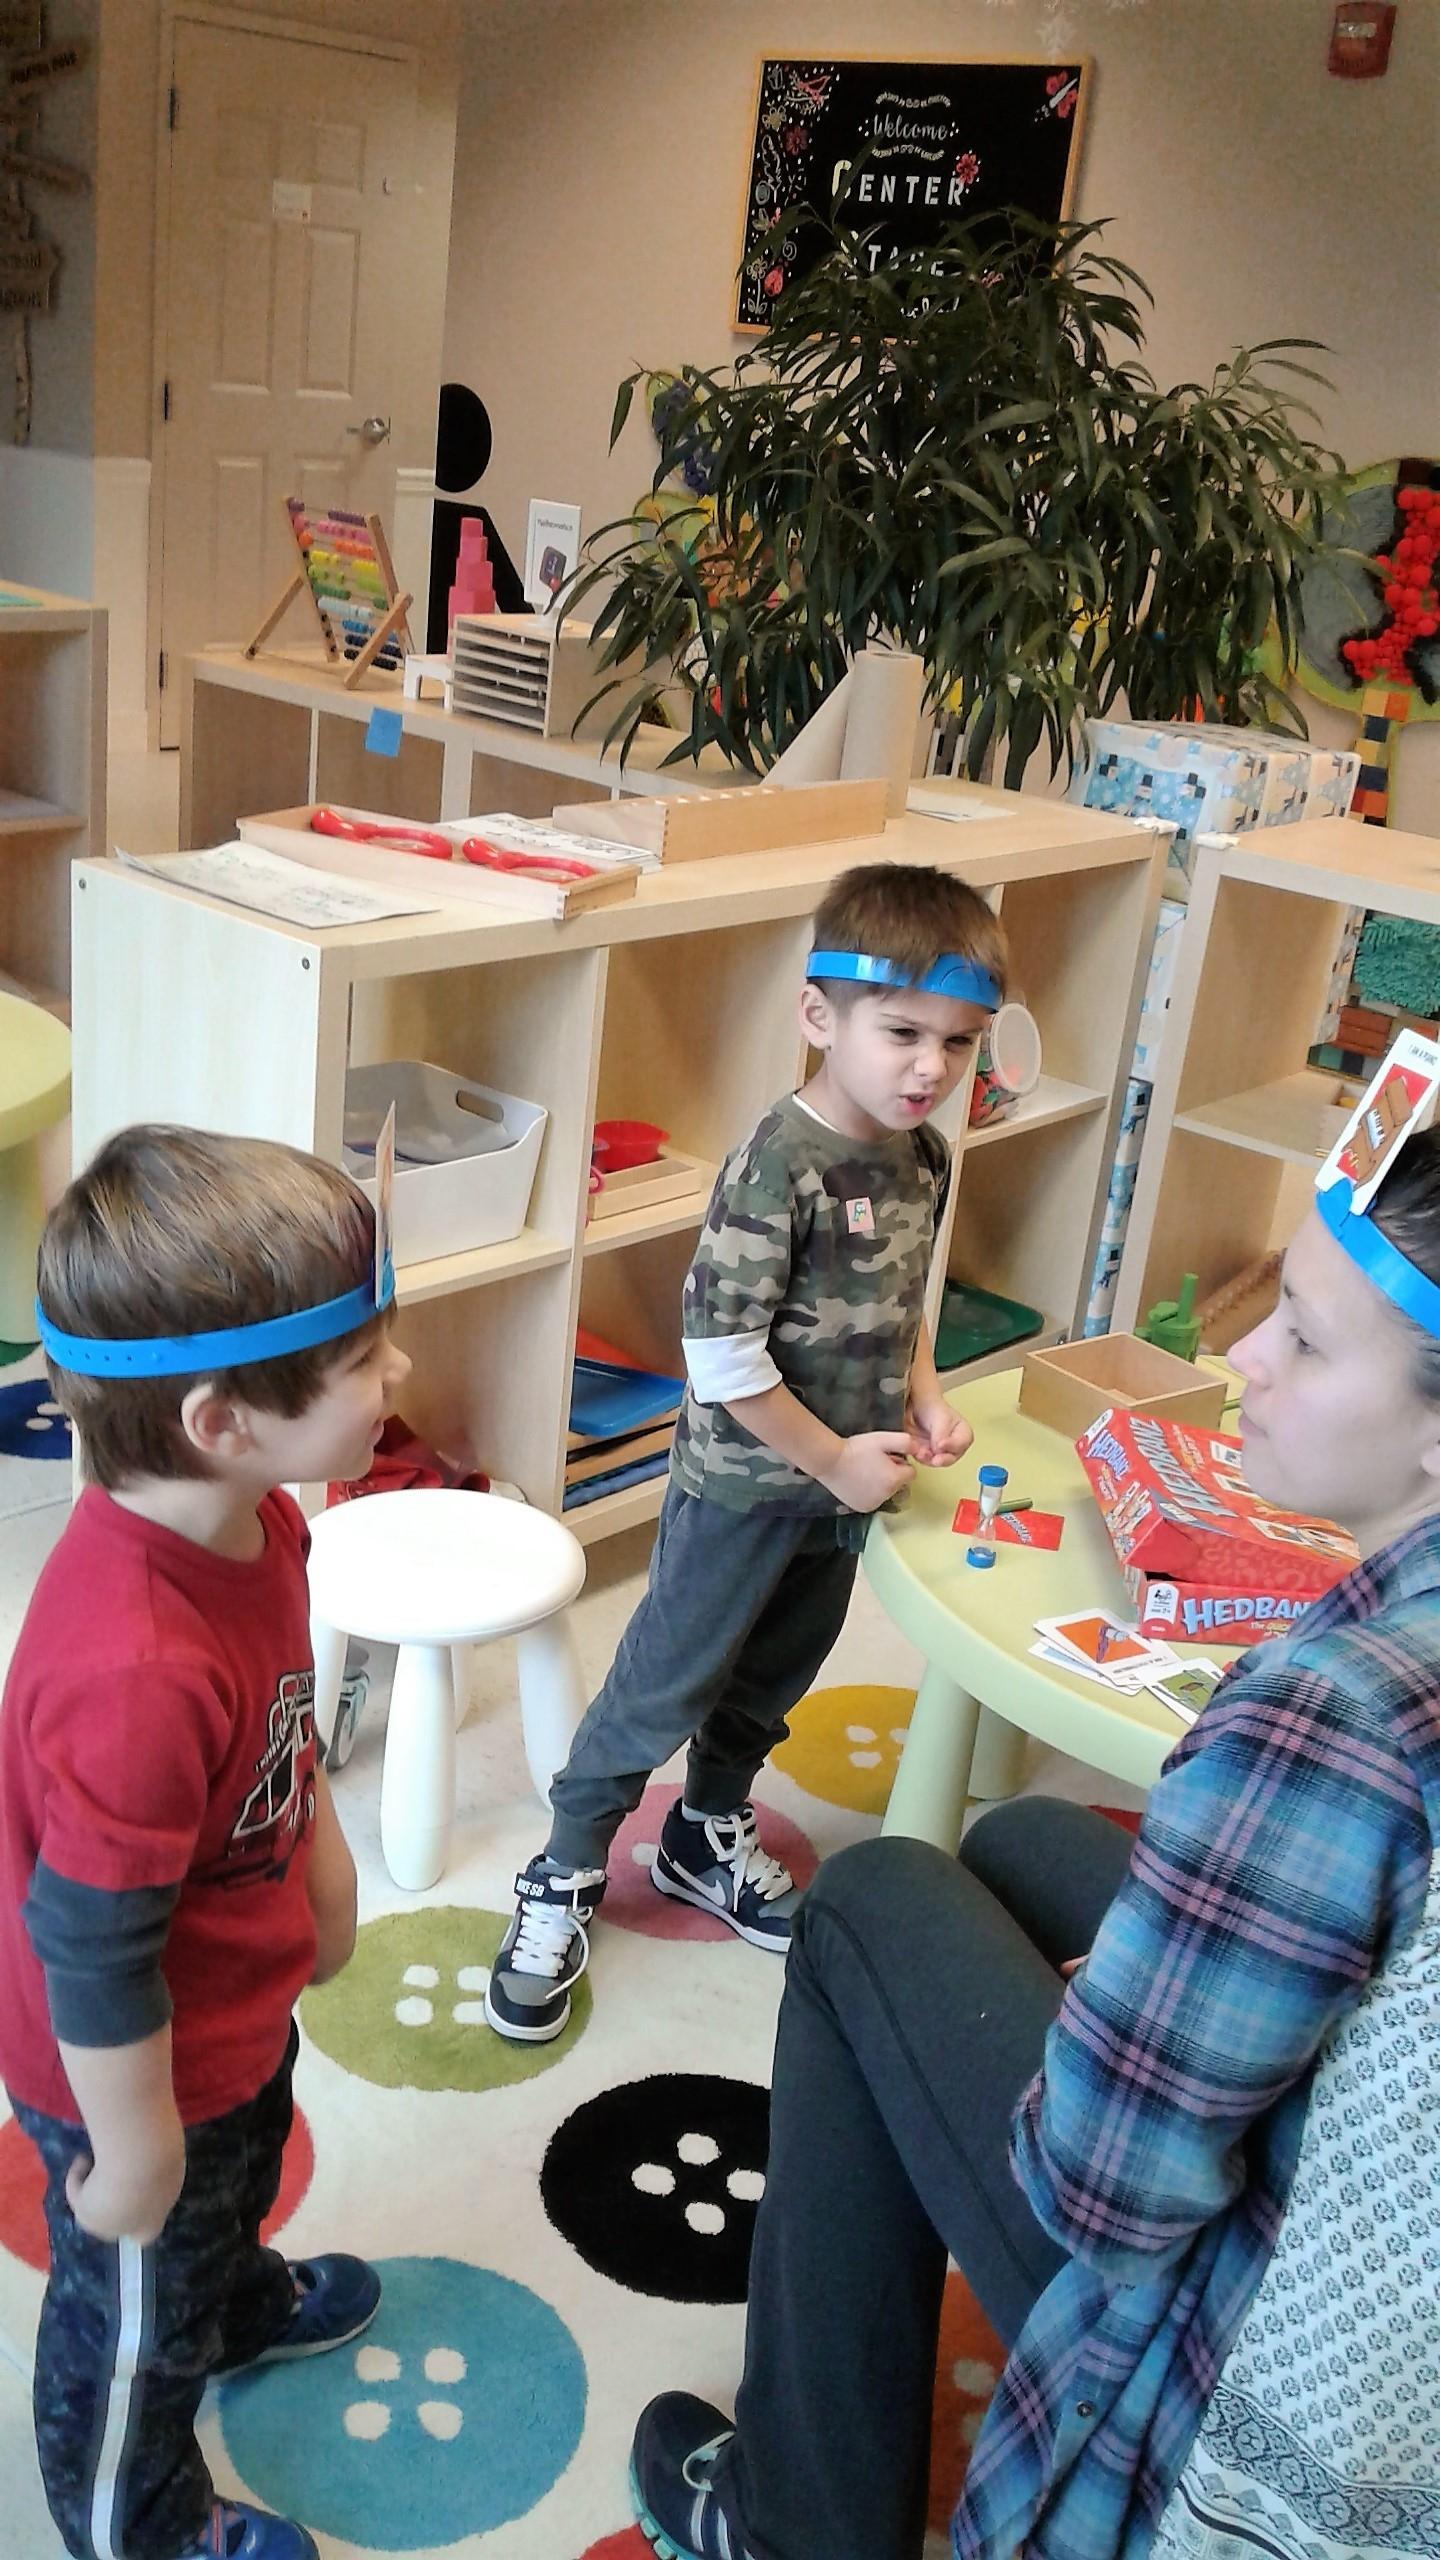 Center Stage Preschool image 44